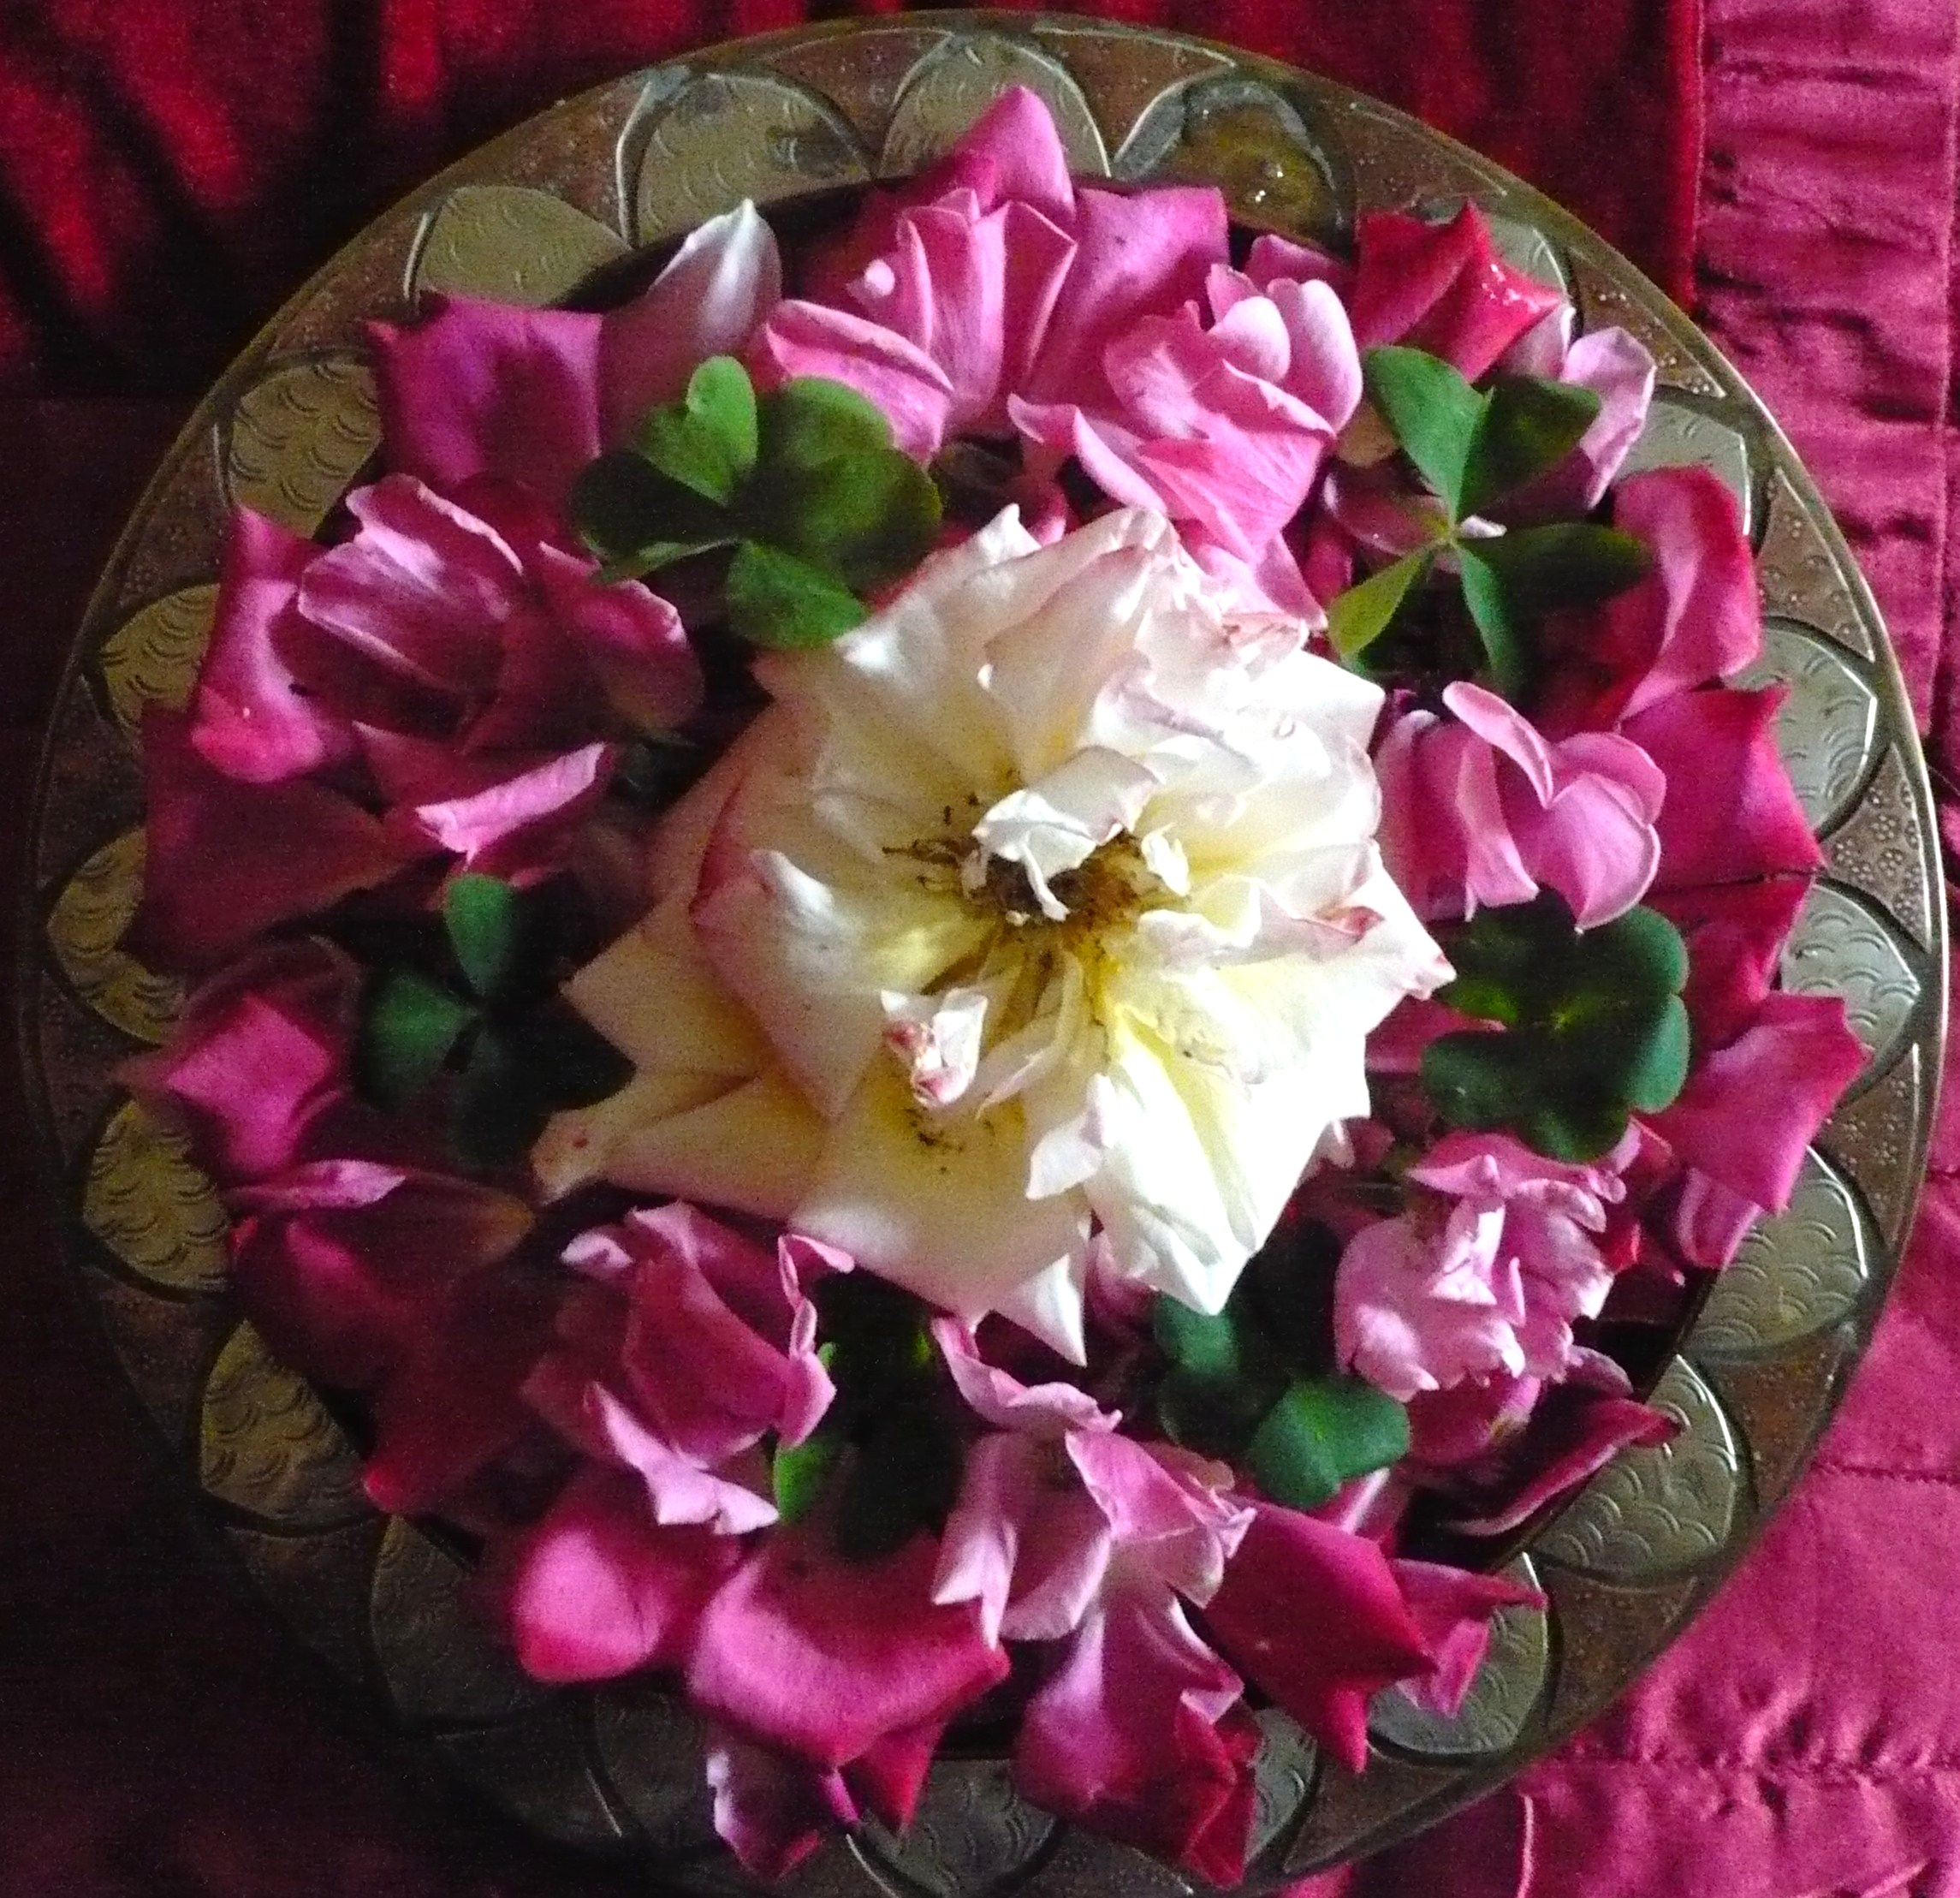 mandala-de-roses-rouges-anniversaire-dadrien-002.JPG